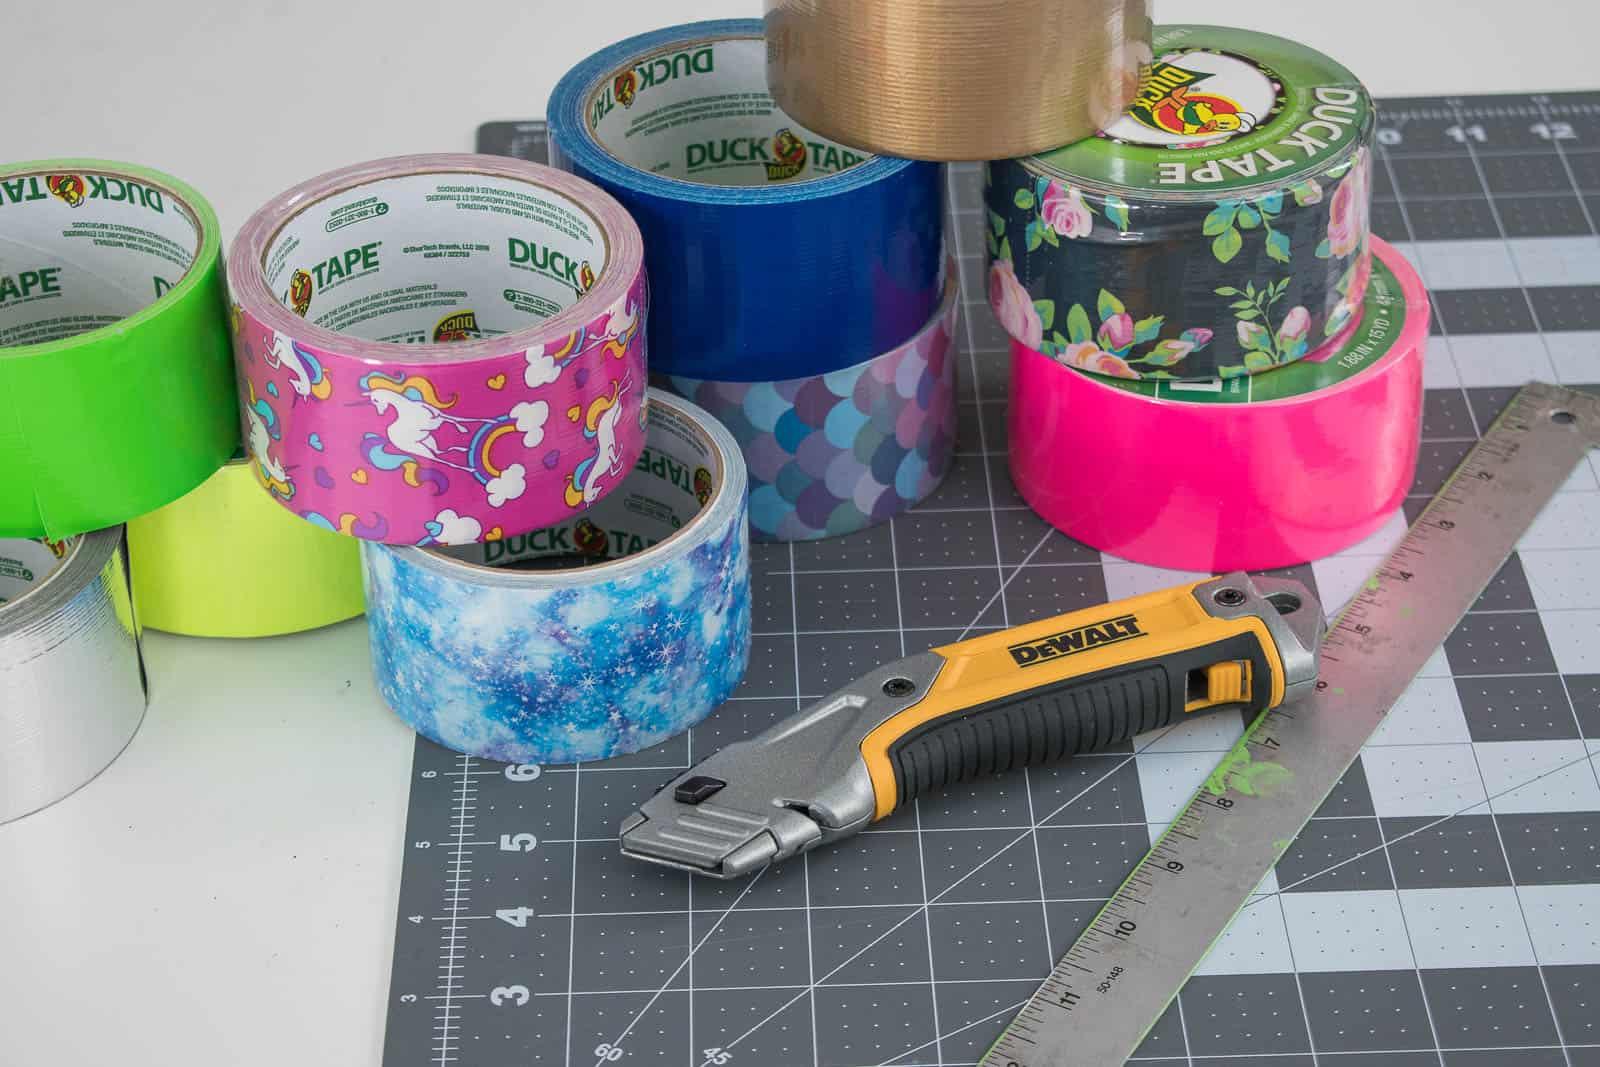 duct tape messenger bag supplies